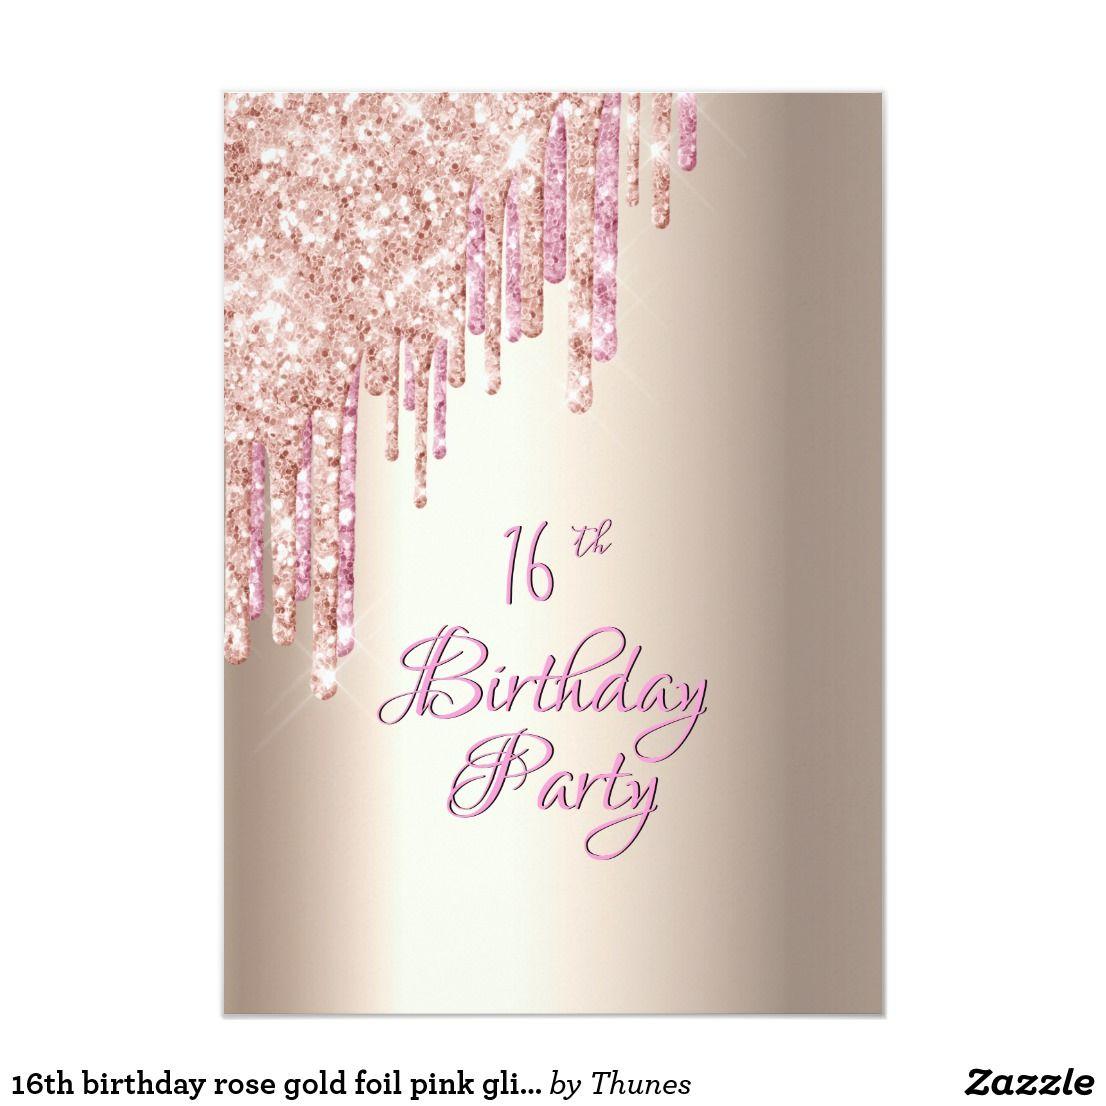 16th Birthday Rose Gold Foil Pink Glitter Drip Invitation Zazzle